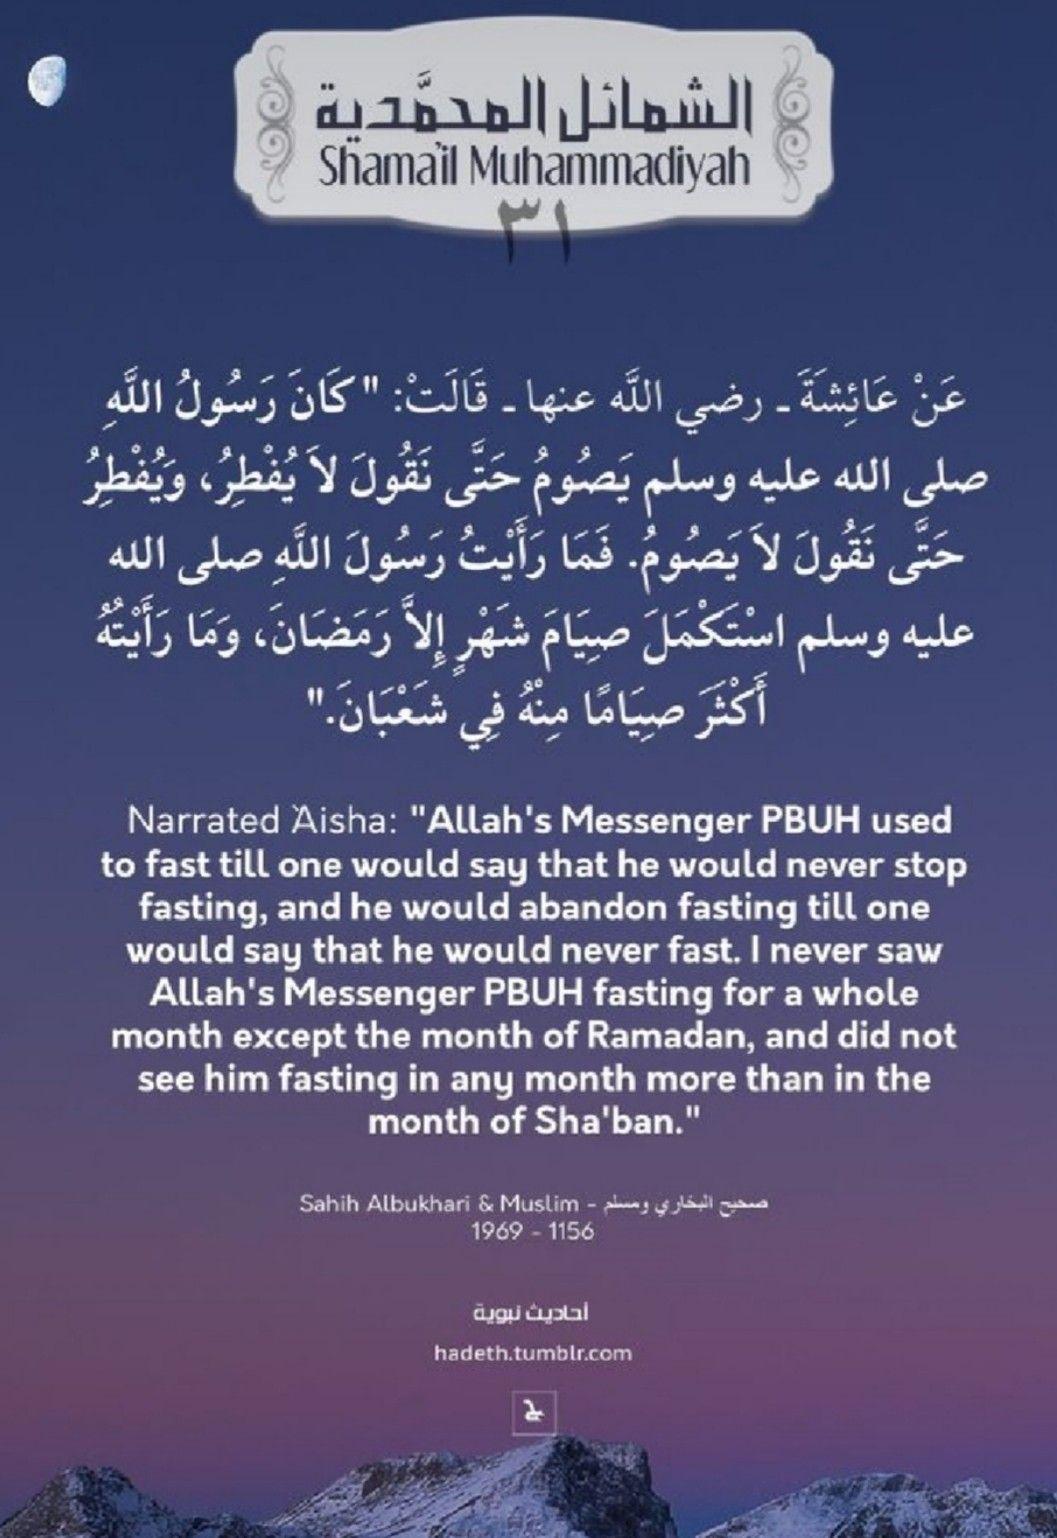 Pin By Aljannah On احاديث نبويه شريفه Hadith Of The Day Sayings Hadith